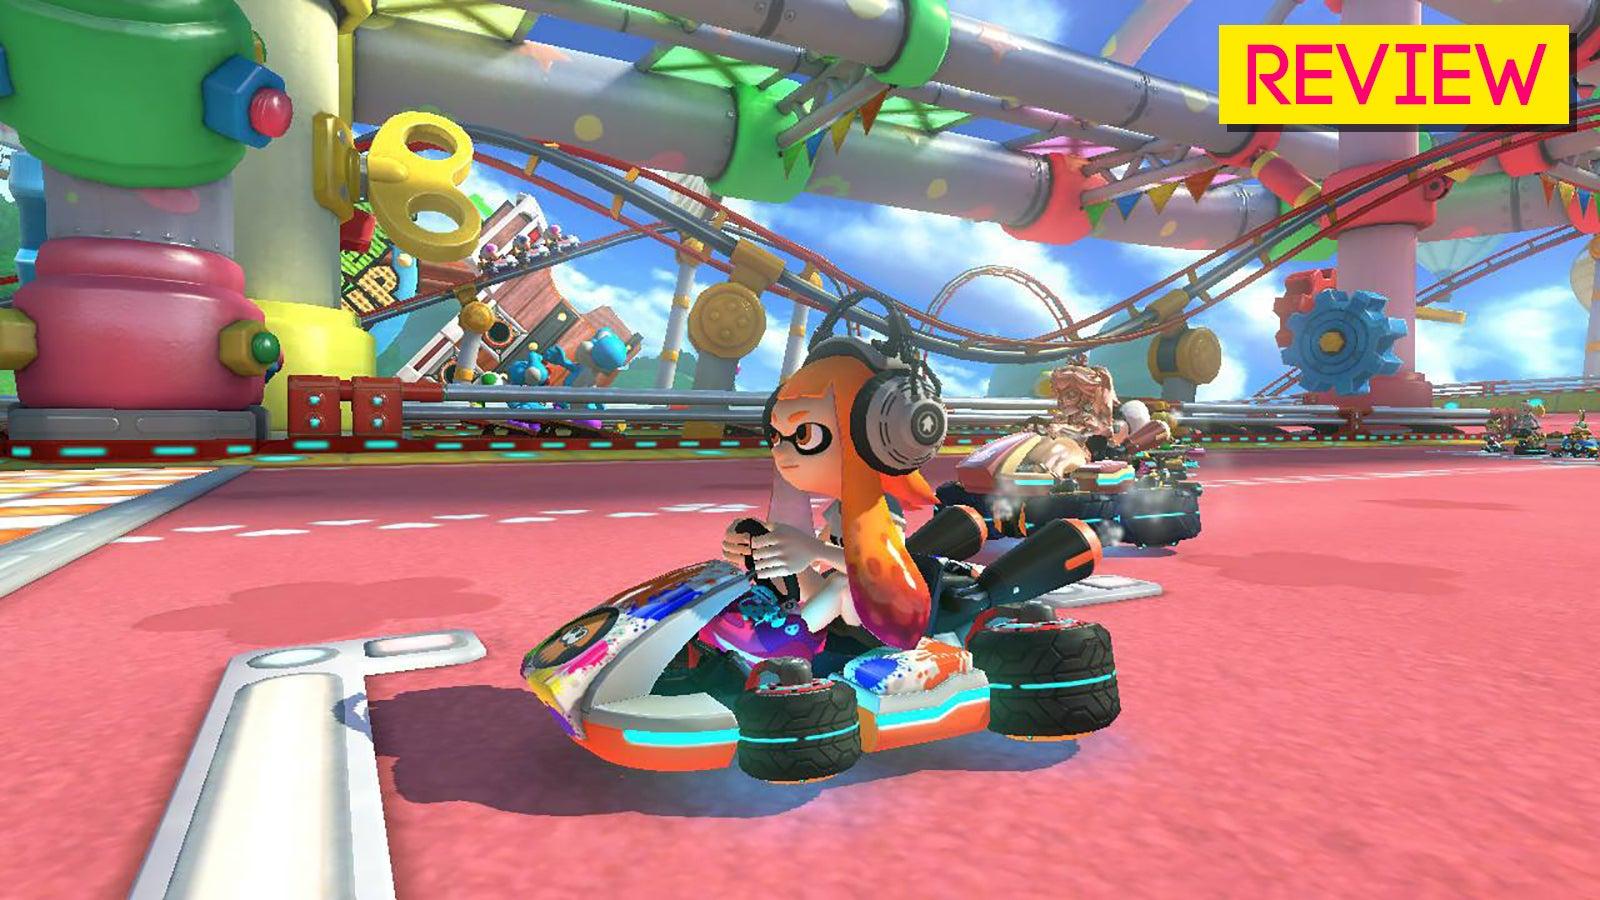 Mario Kart 8 Deluxe: The Kotaku Review